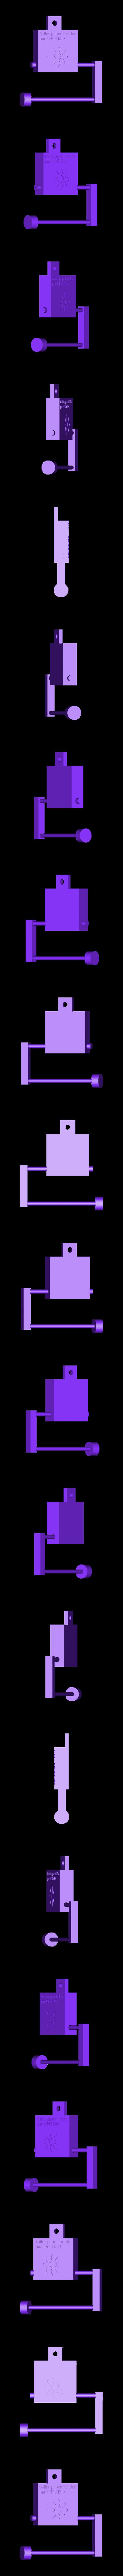 PQv2.stl Download STL file Toilet paper holder • 3D printable model, dmsi3d